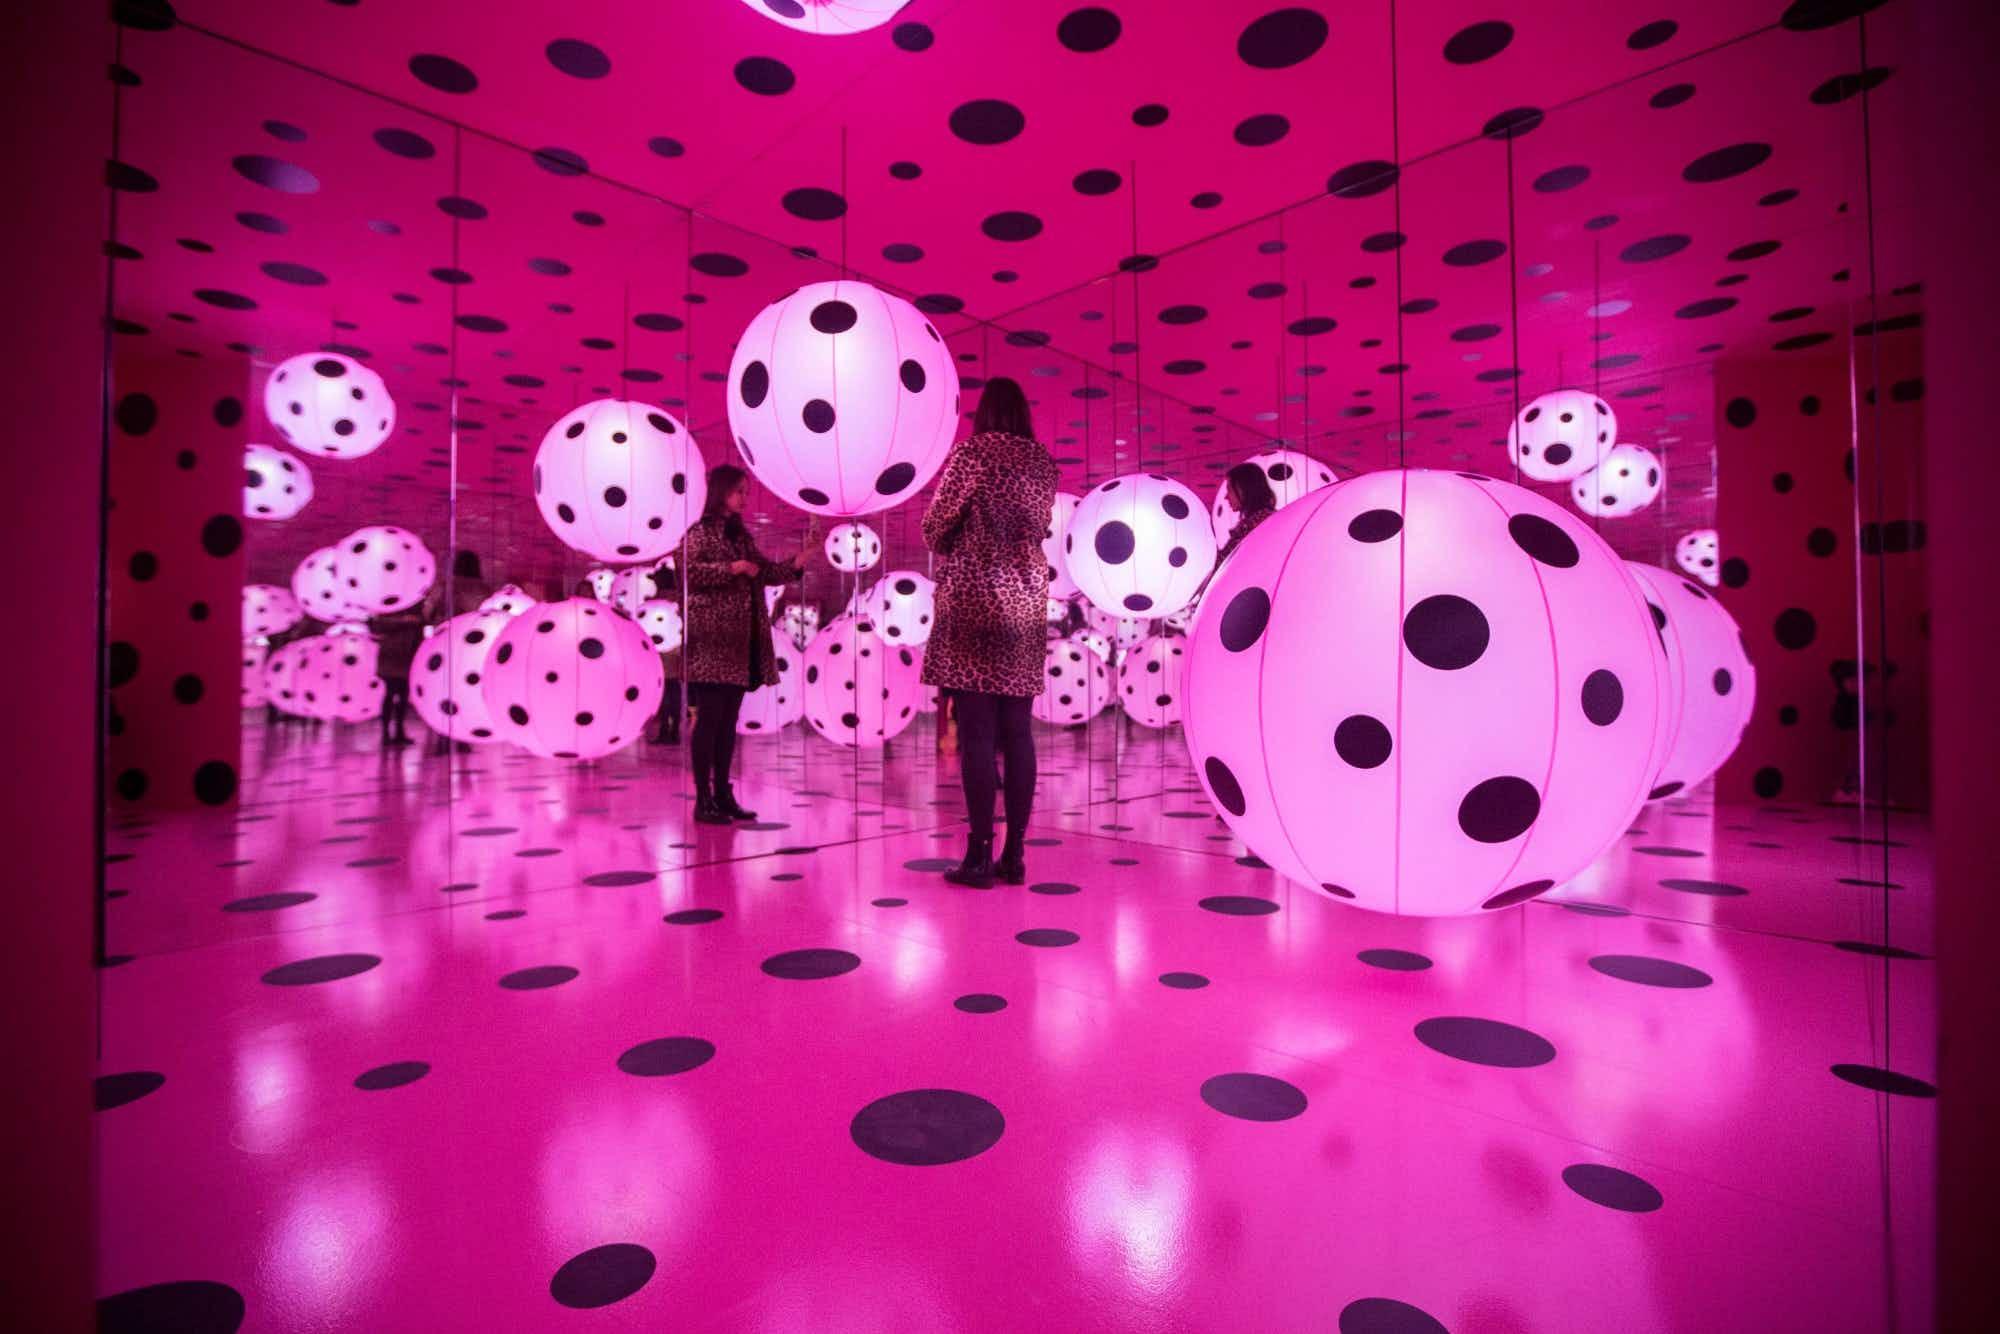 Infinity Mirrors exhibit is returning to Toronto permanently